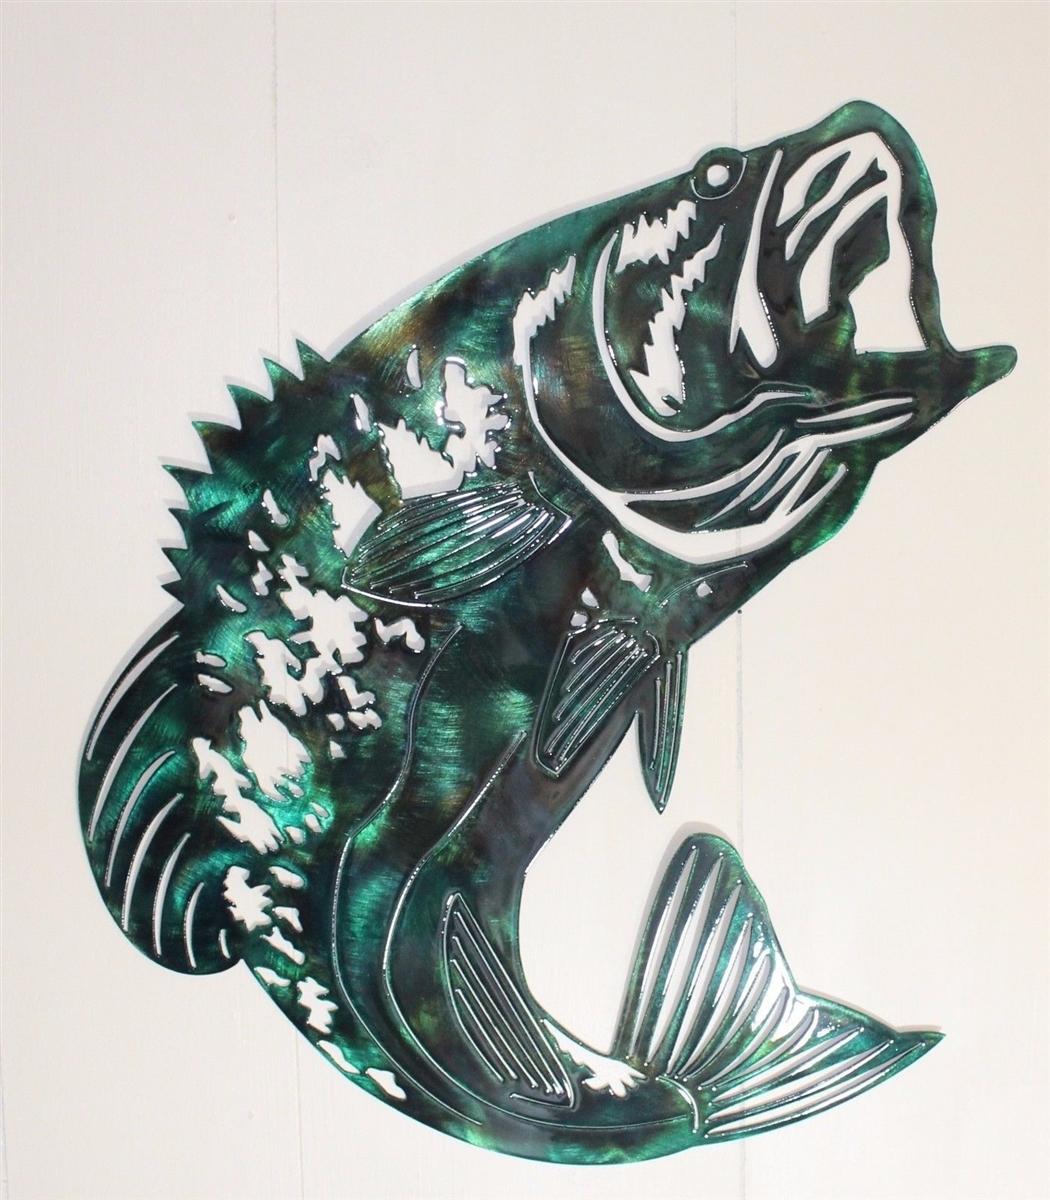 metal fish art wall decor.htm bass fish metal wall art  bass fish metal wall art